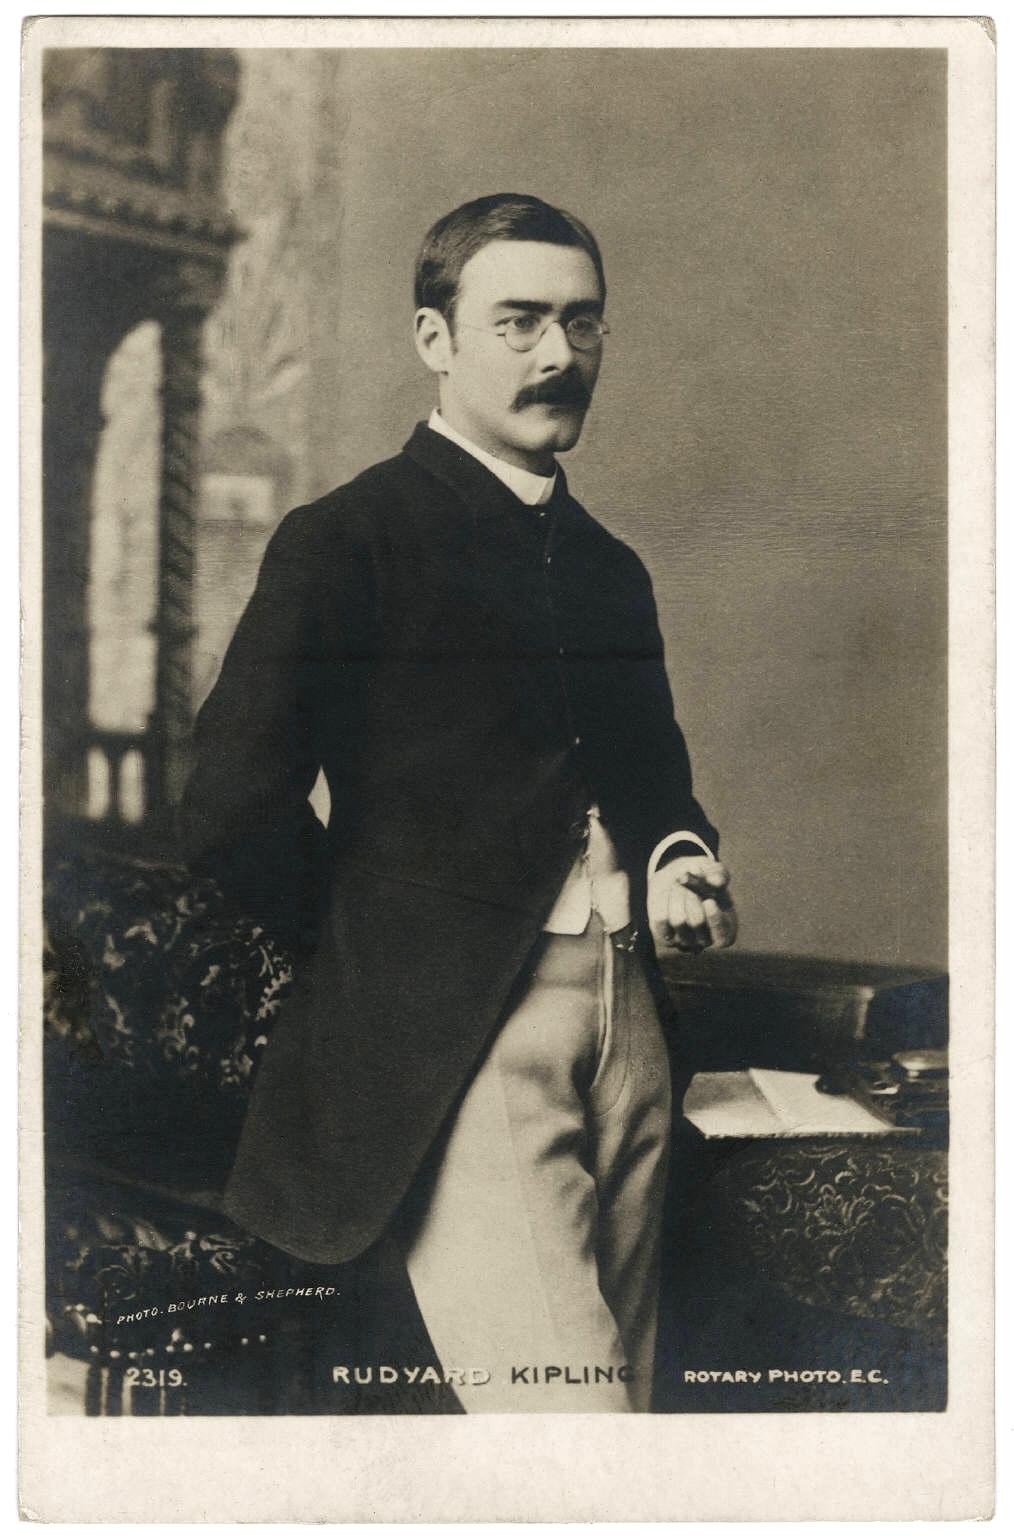 Rudyard_Kipling_three_quarter_length_portrait